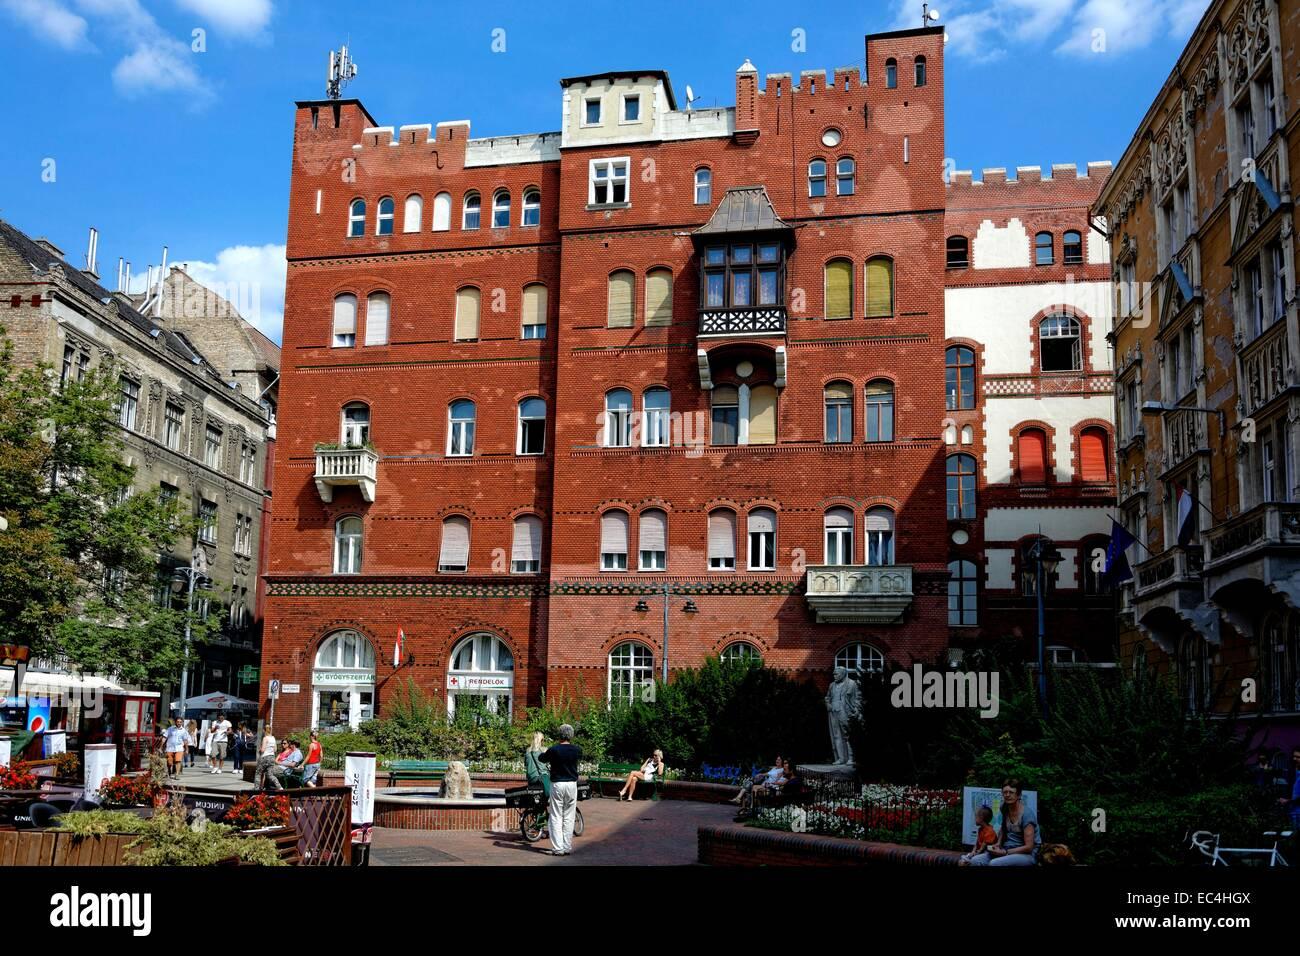 italian palazzo style